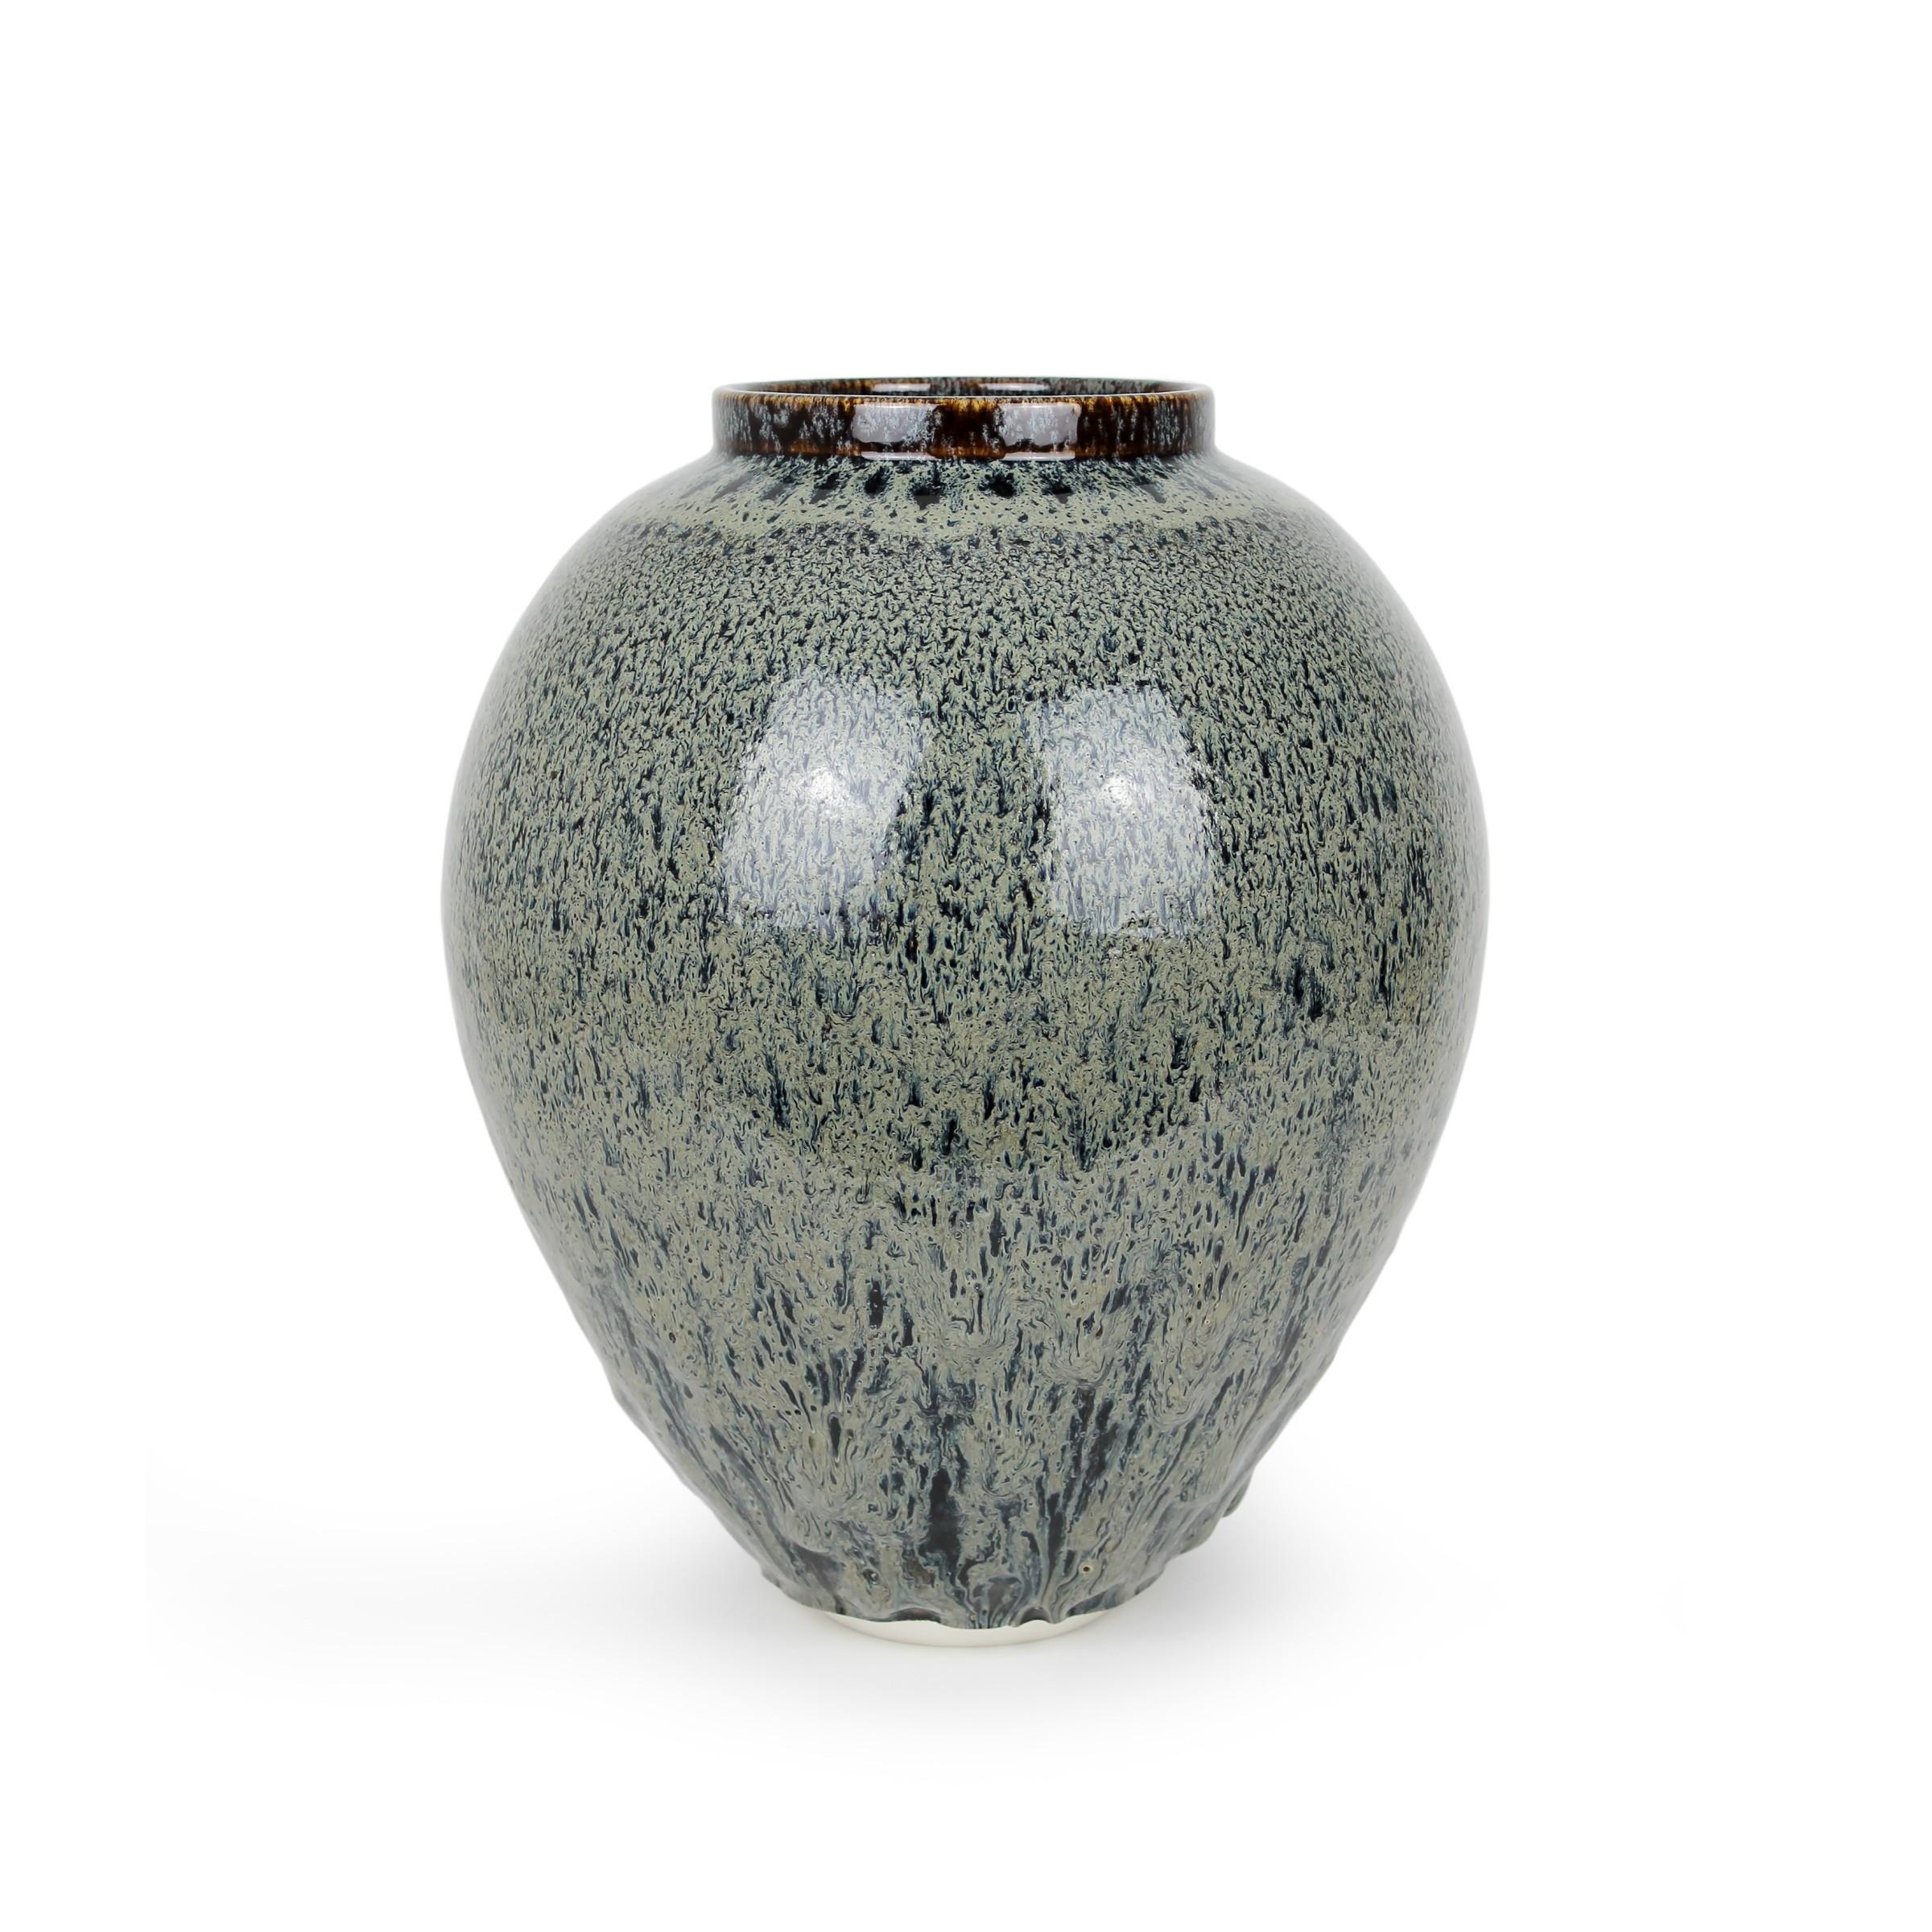 "<span class=""link fancybox-details-link""><a href=""/exhibitions/45/works/artworks3348/"">View Detail Page</a></span><div class=""artist""><strong>Albert Montserrat</strong></div><div class=""title""><em>Bear Fur Vessel</em>, 2020</div><div class=""medium"">Oil - Spot Glazed Thrown Porcelain</div><div class=""dimensions"">42 x 35 x 35 cm<br>16 1/2 x 13 3/4 x 13 3/4 in.</div>"